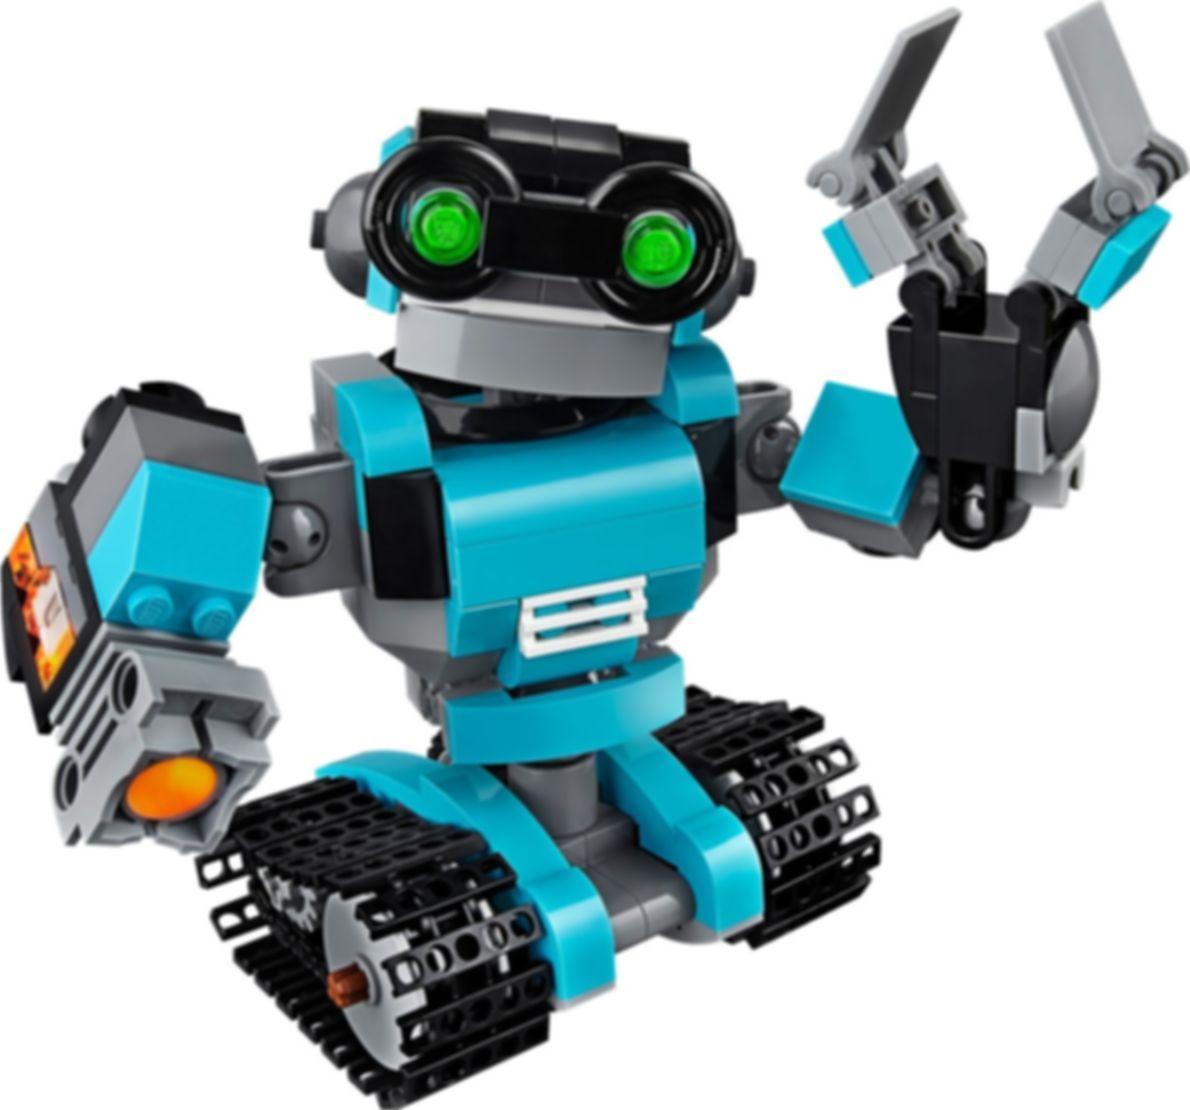 Robo Explorer gameplay